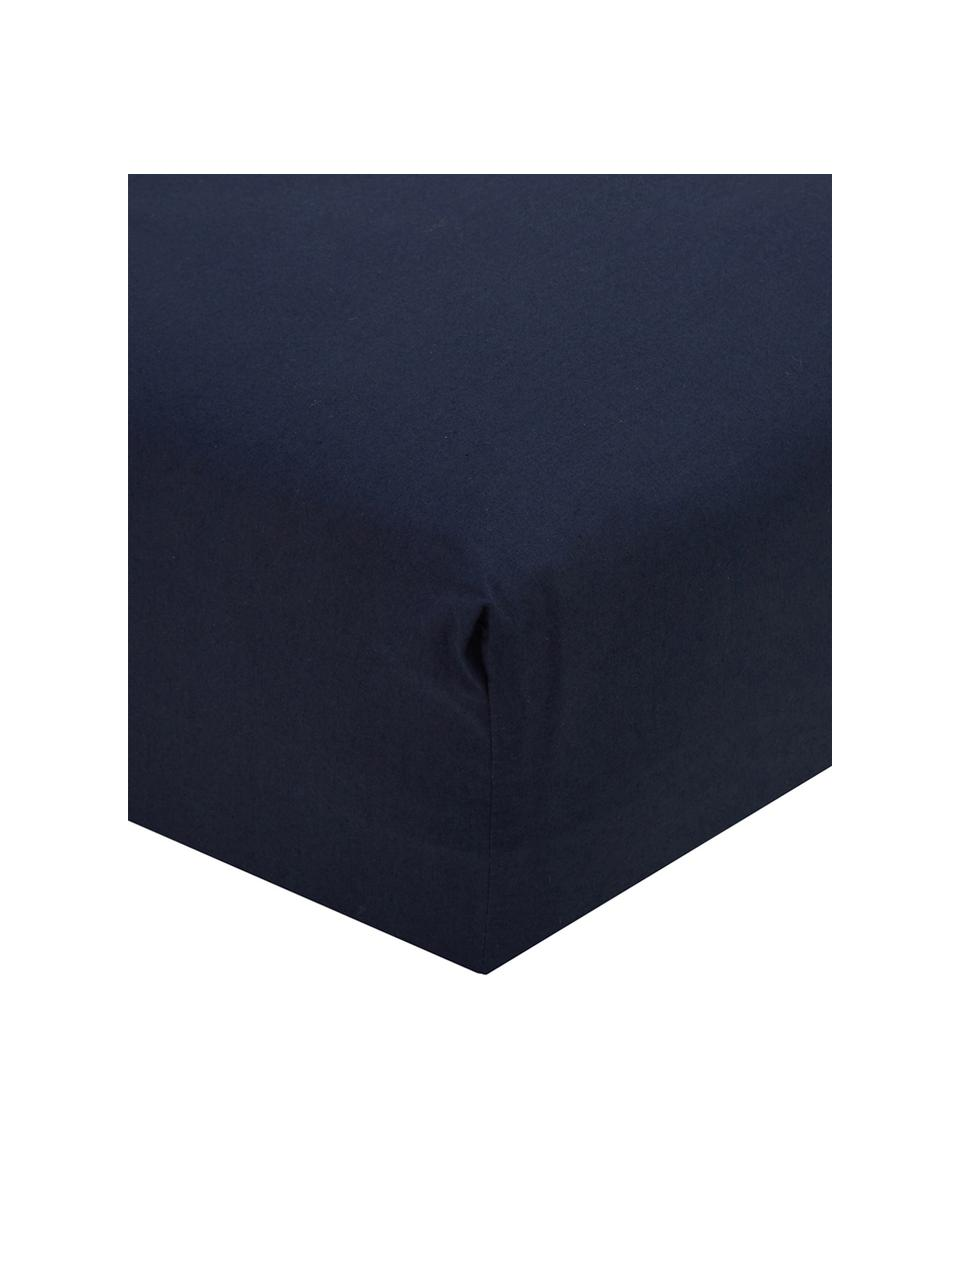 Lenzuolo con angoli in percalle blu scuro Elsie, Blu scuro, Larg. 180 x Lung. 200 cm